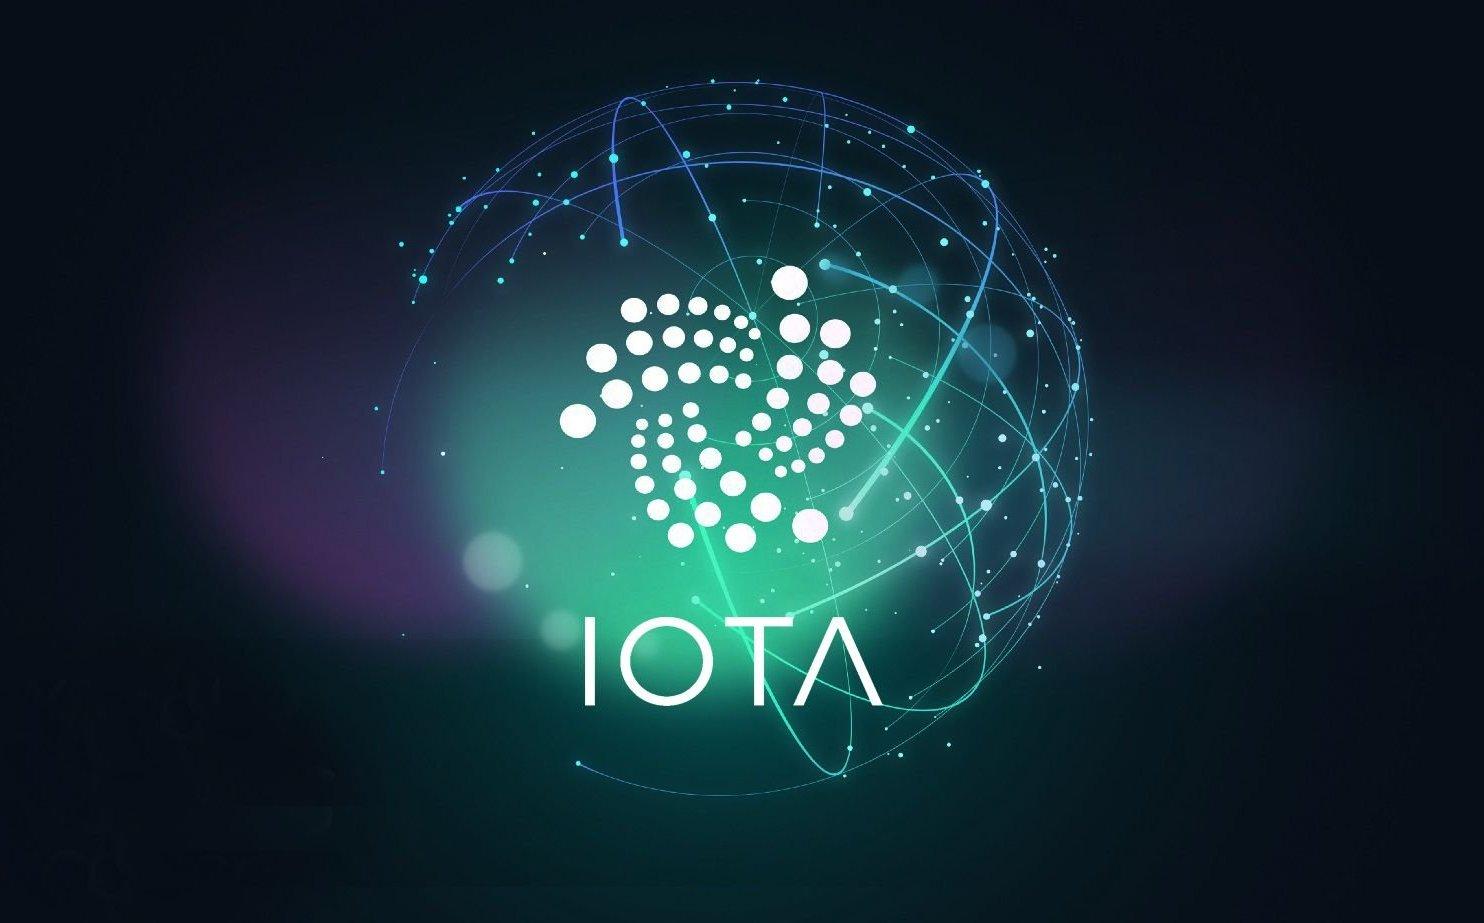 Kriptovalyuta Iota - sopernik bitkoina